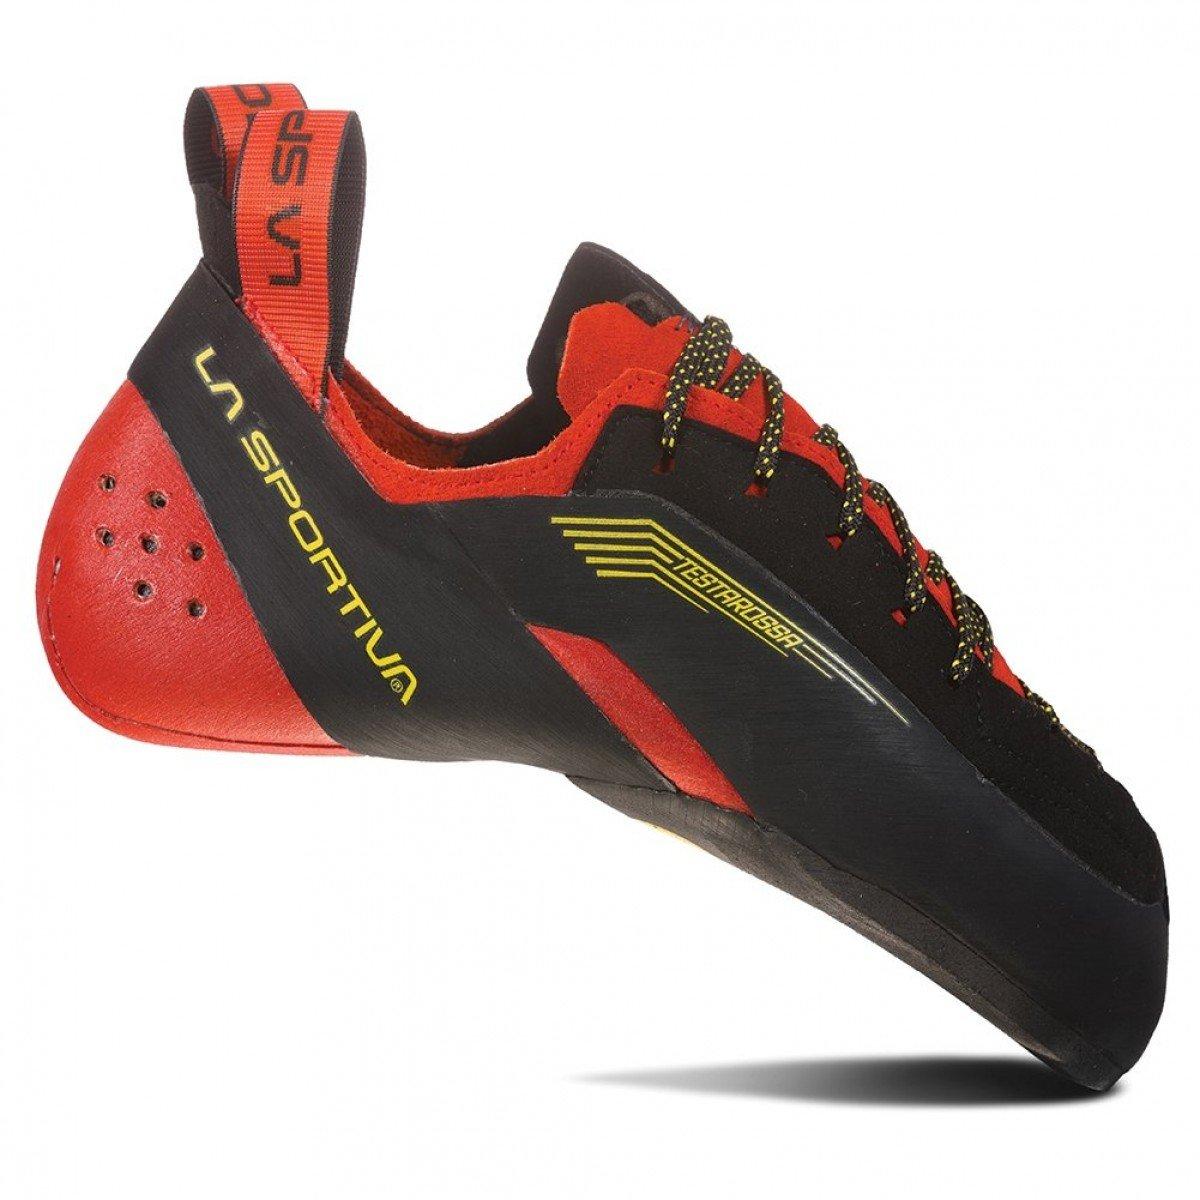 photo: La Sportiva Testarossa climbing shoe